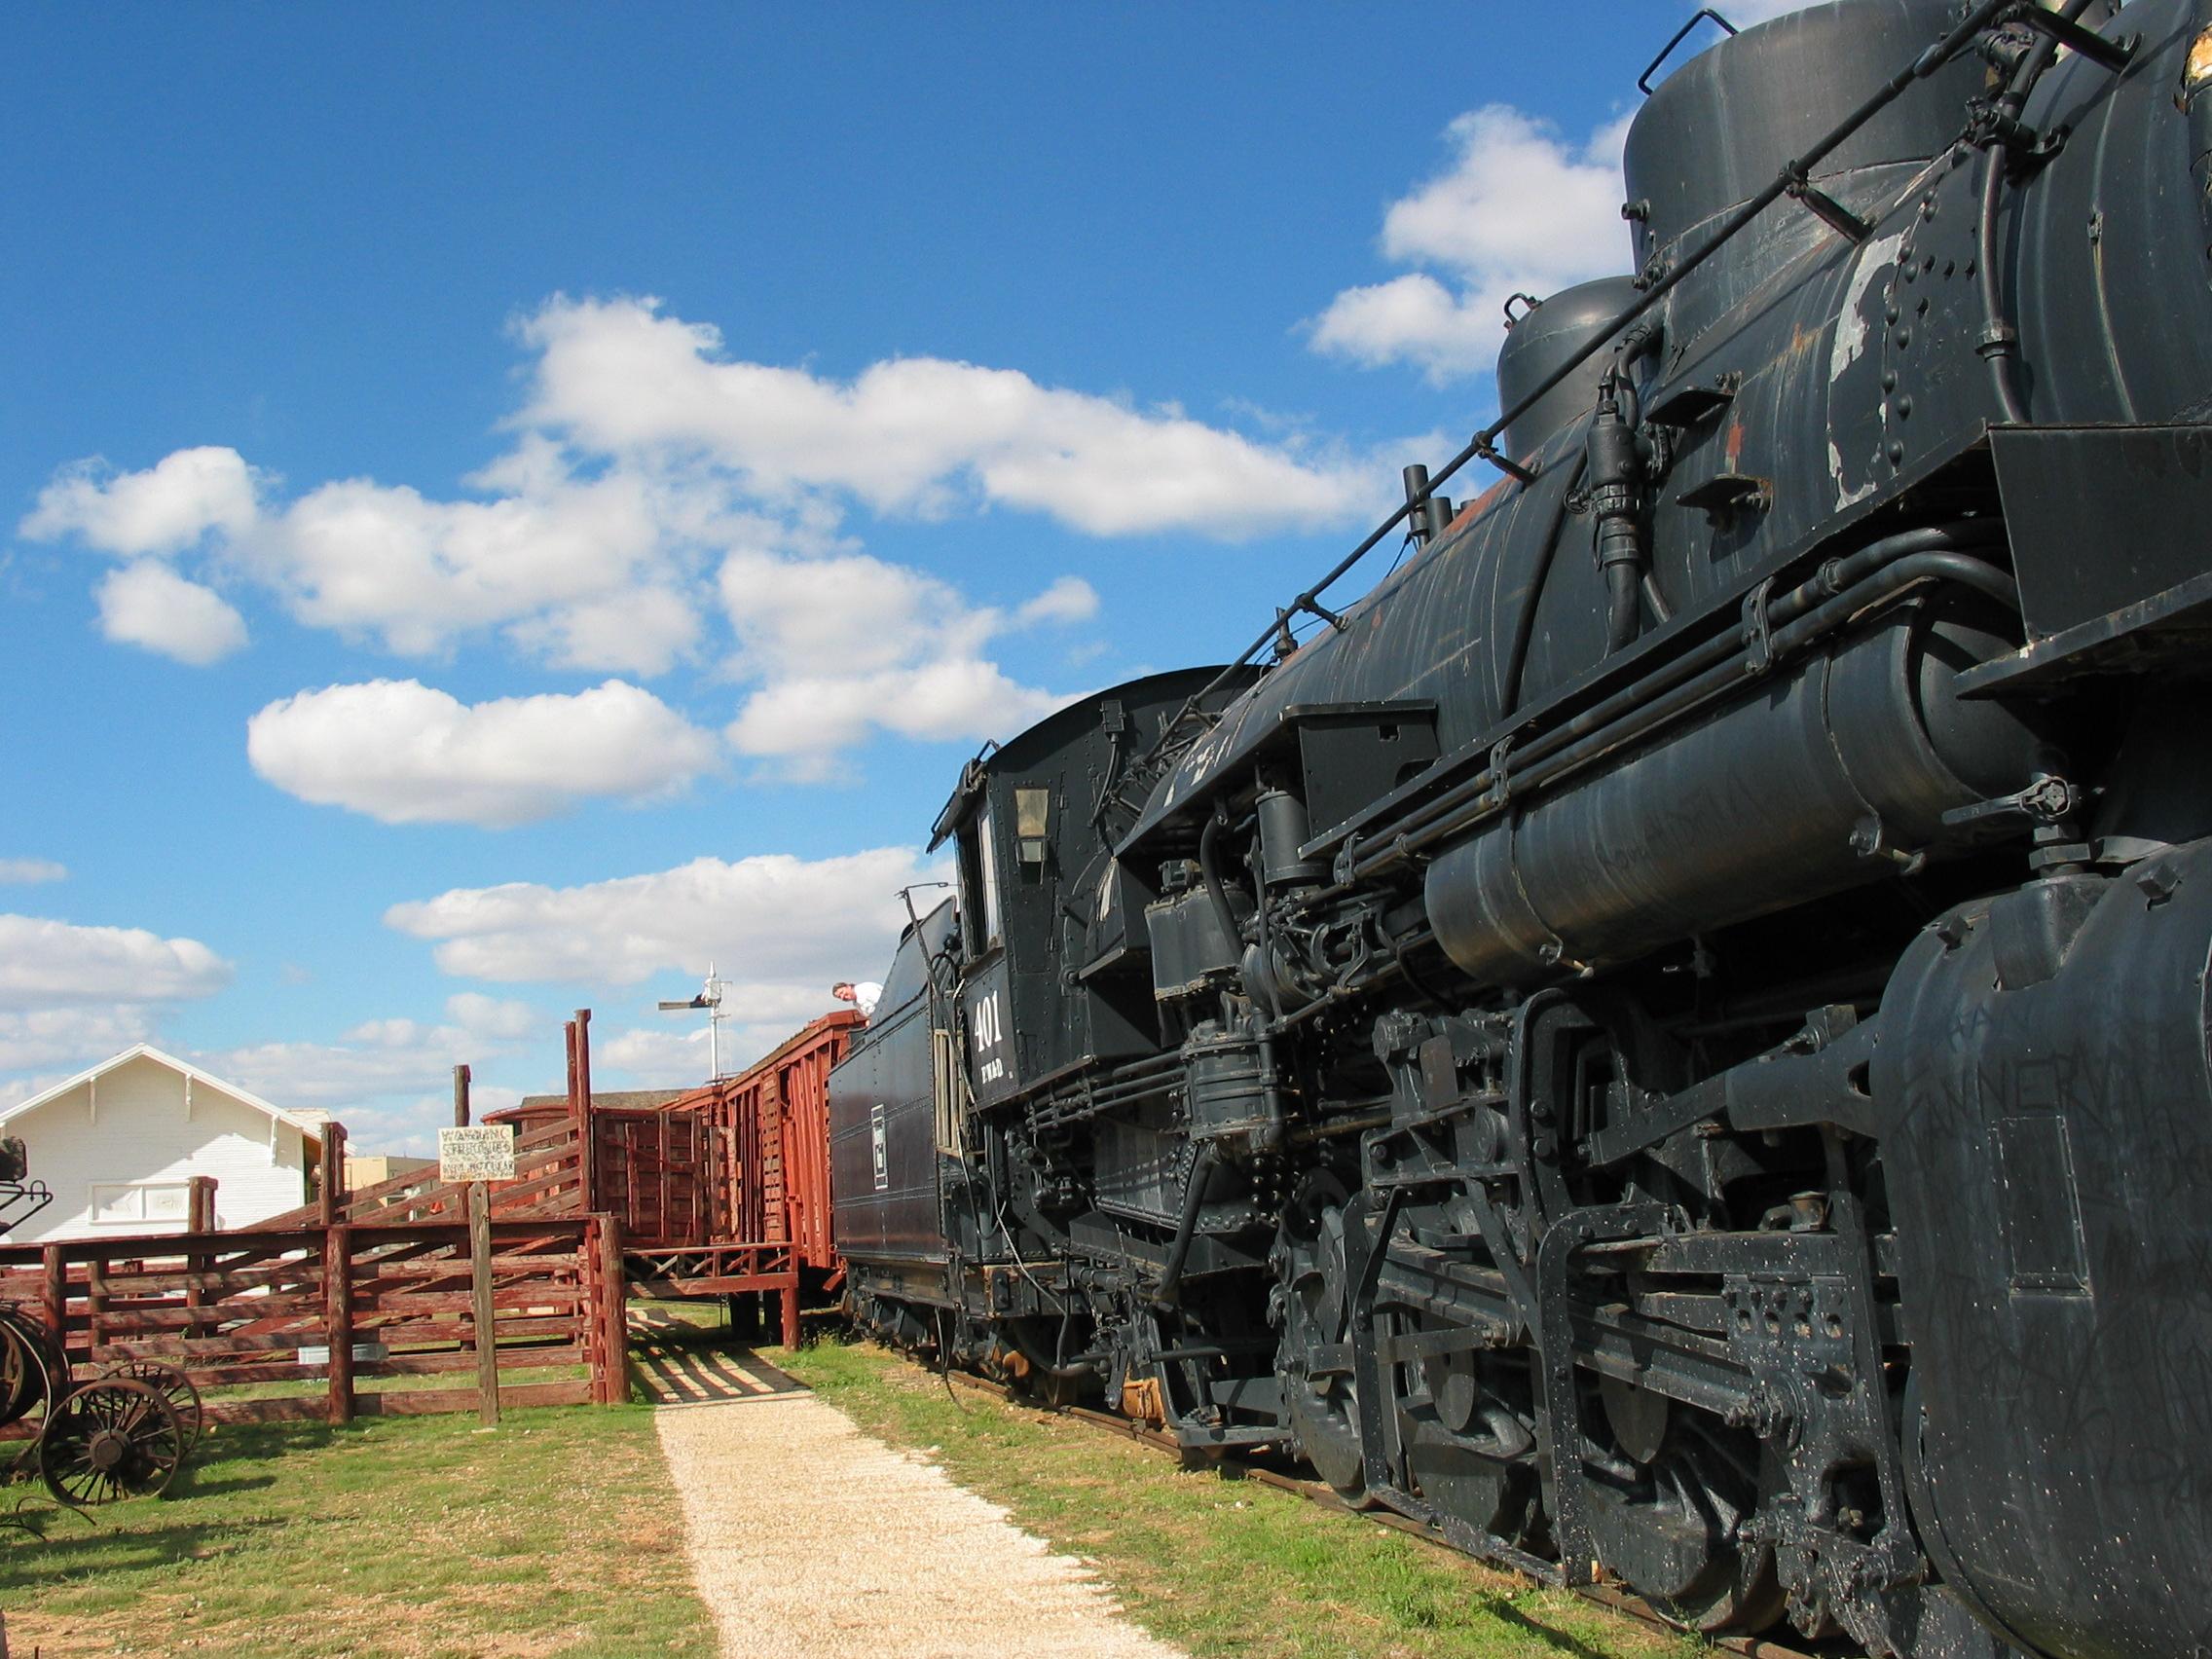 Steam Train Hd Wallpaper Background Image 2272x1704 Id